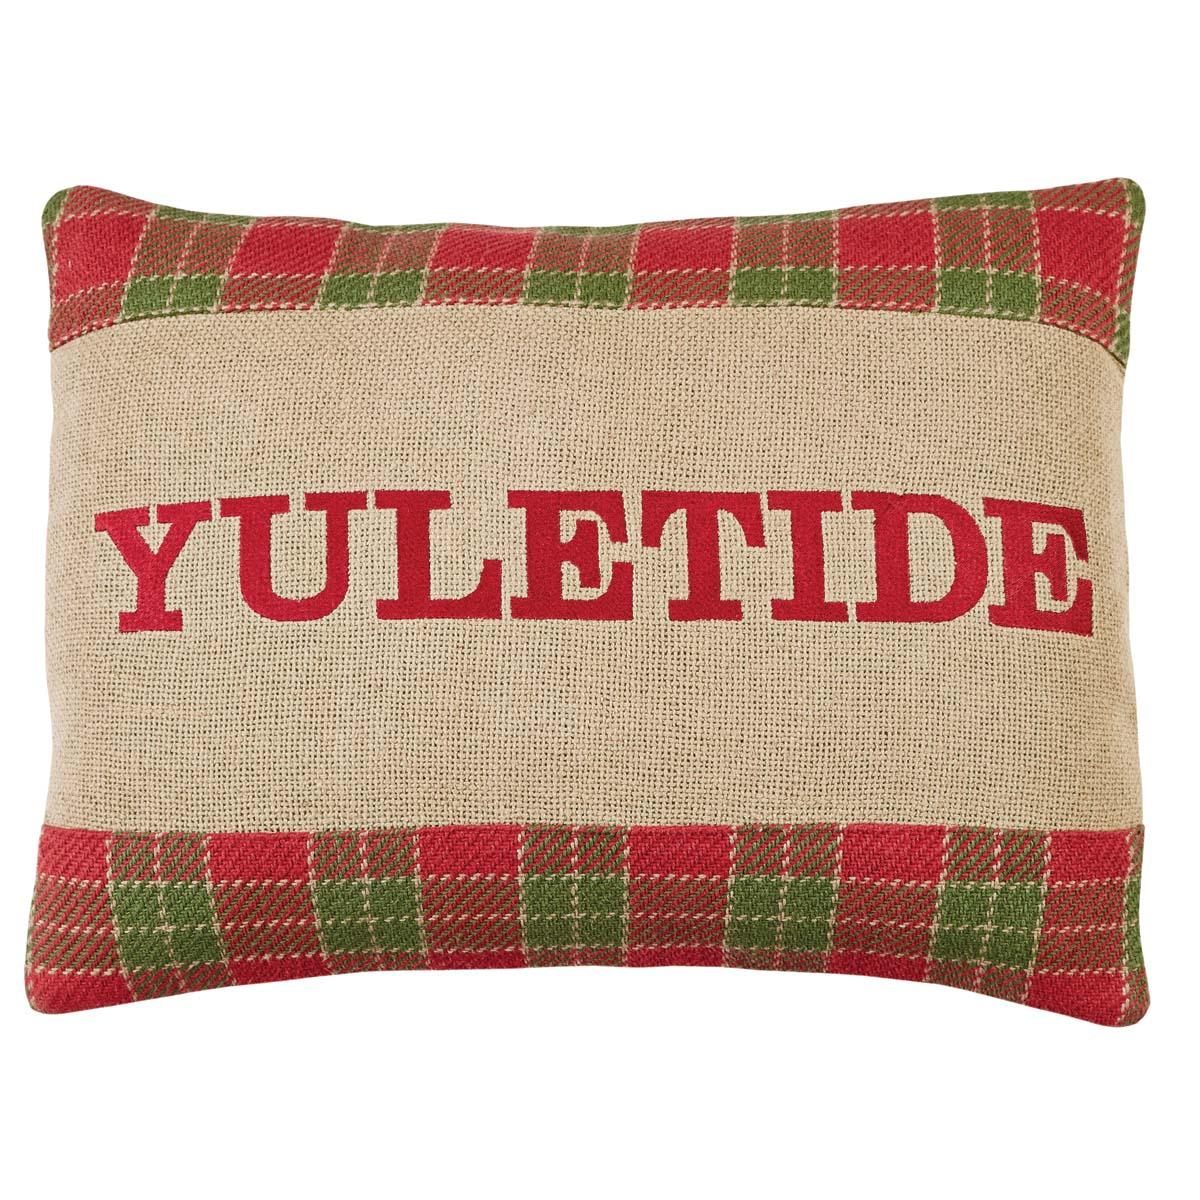 Robert Yuletide Pillow 14x18